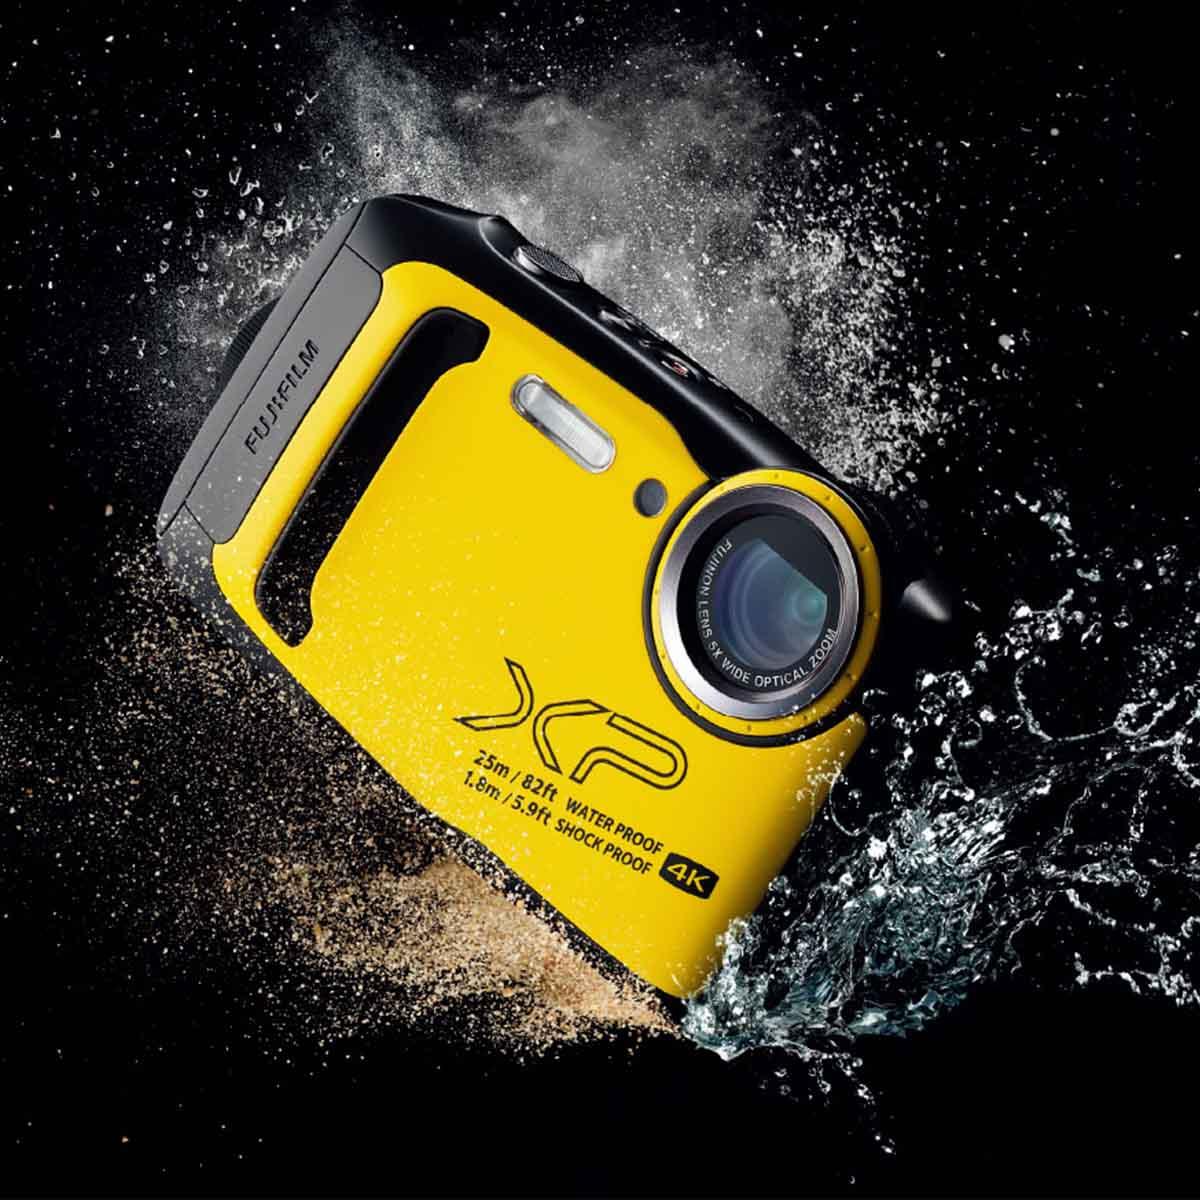 Рейтинг водонепроницаемых камер